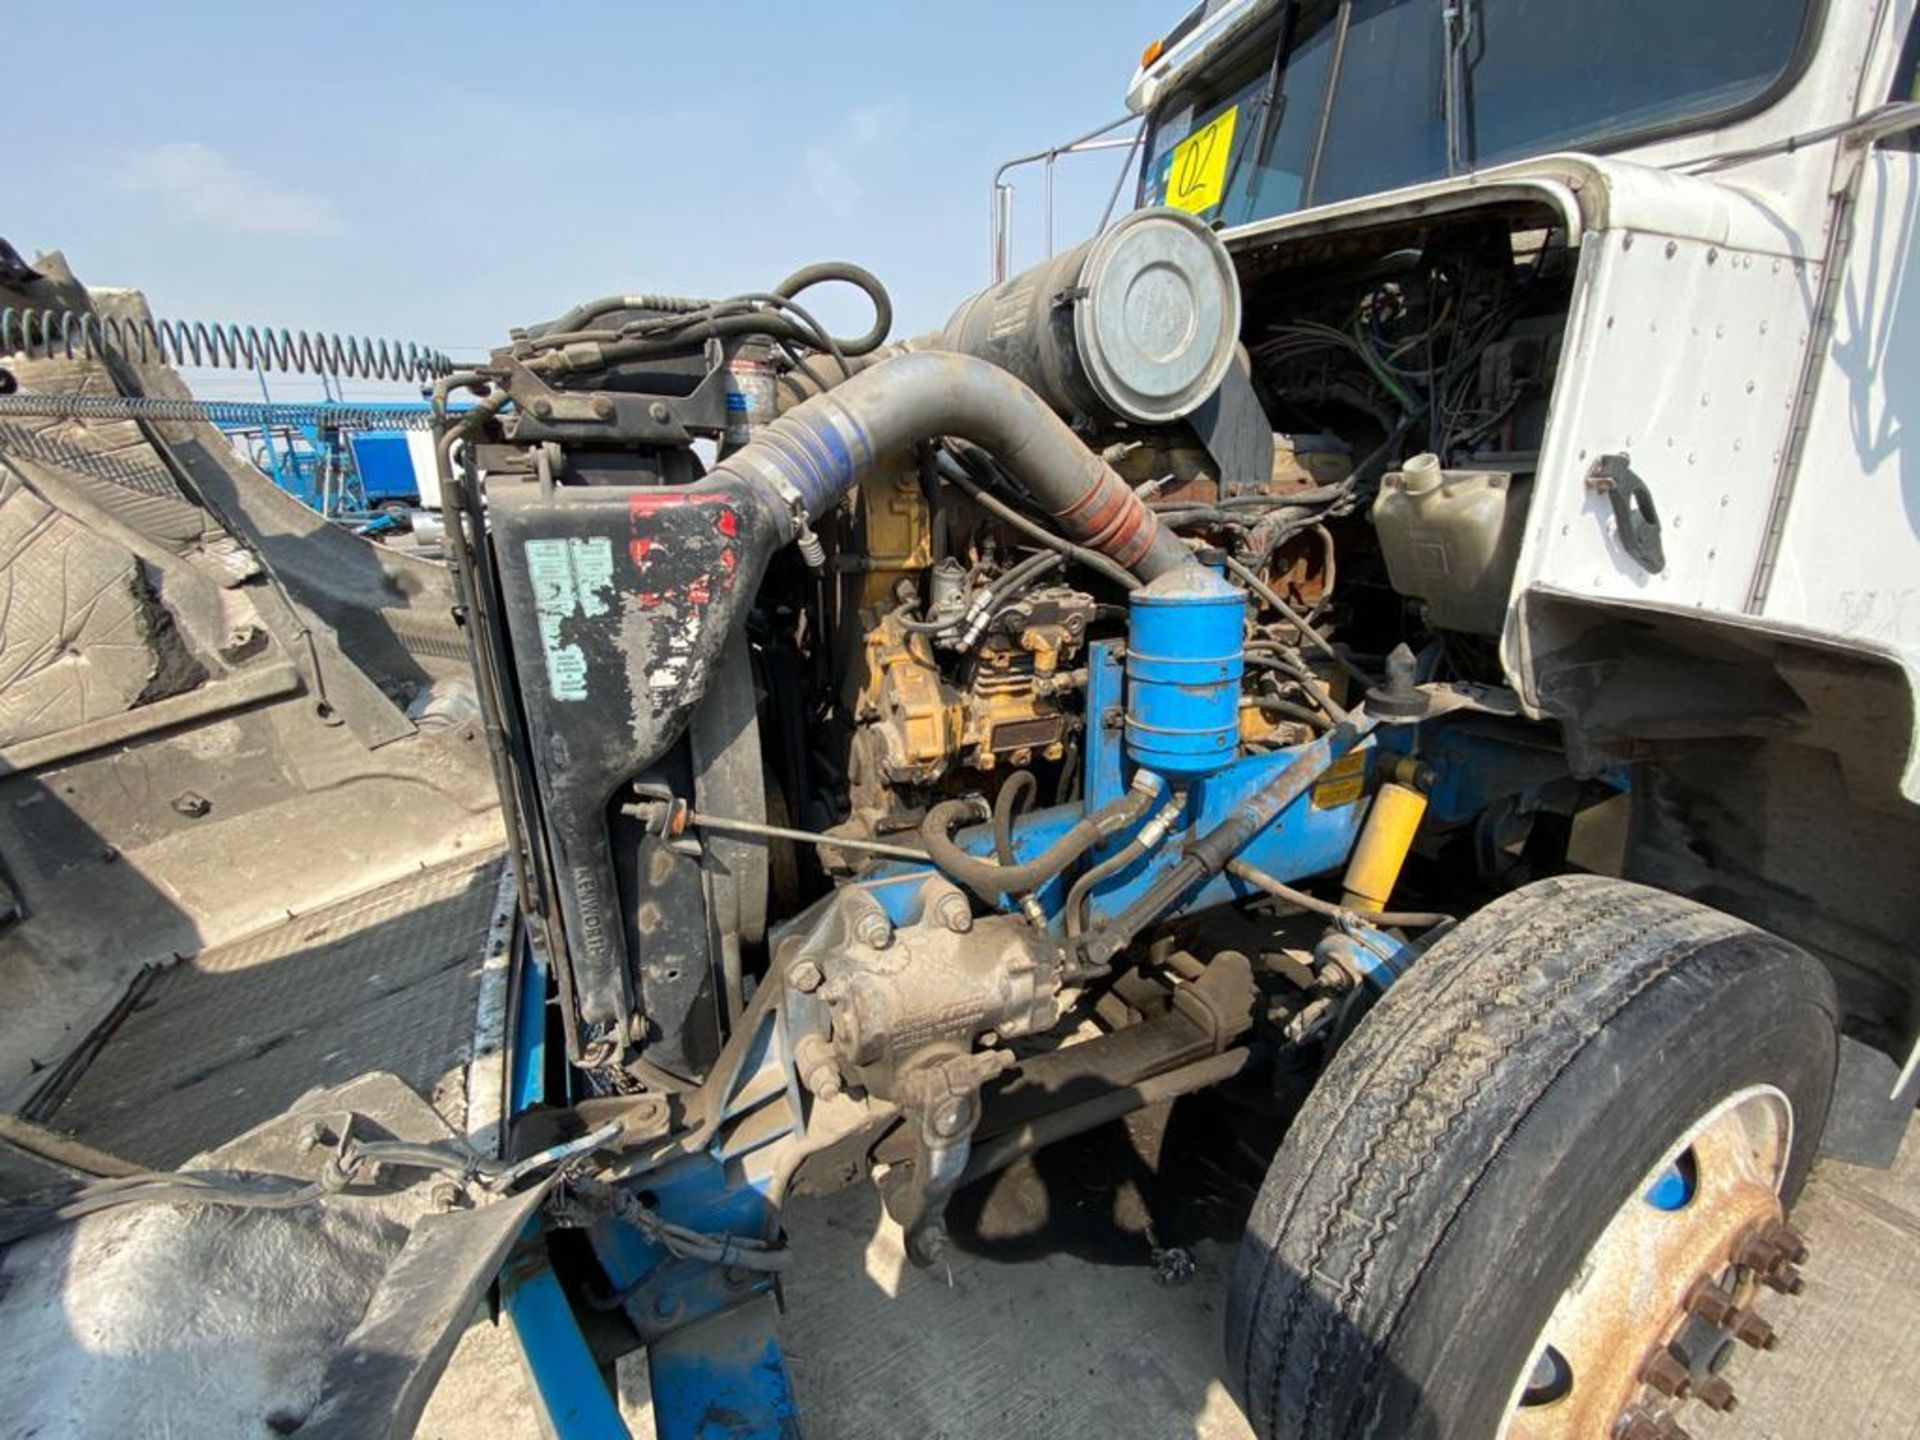 1999 Kenworth Sleeper truck tractor, standard transmission of 18 speeds - Image 59 of 75